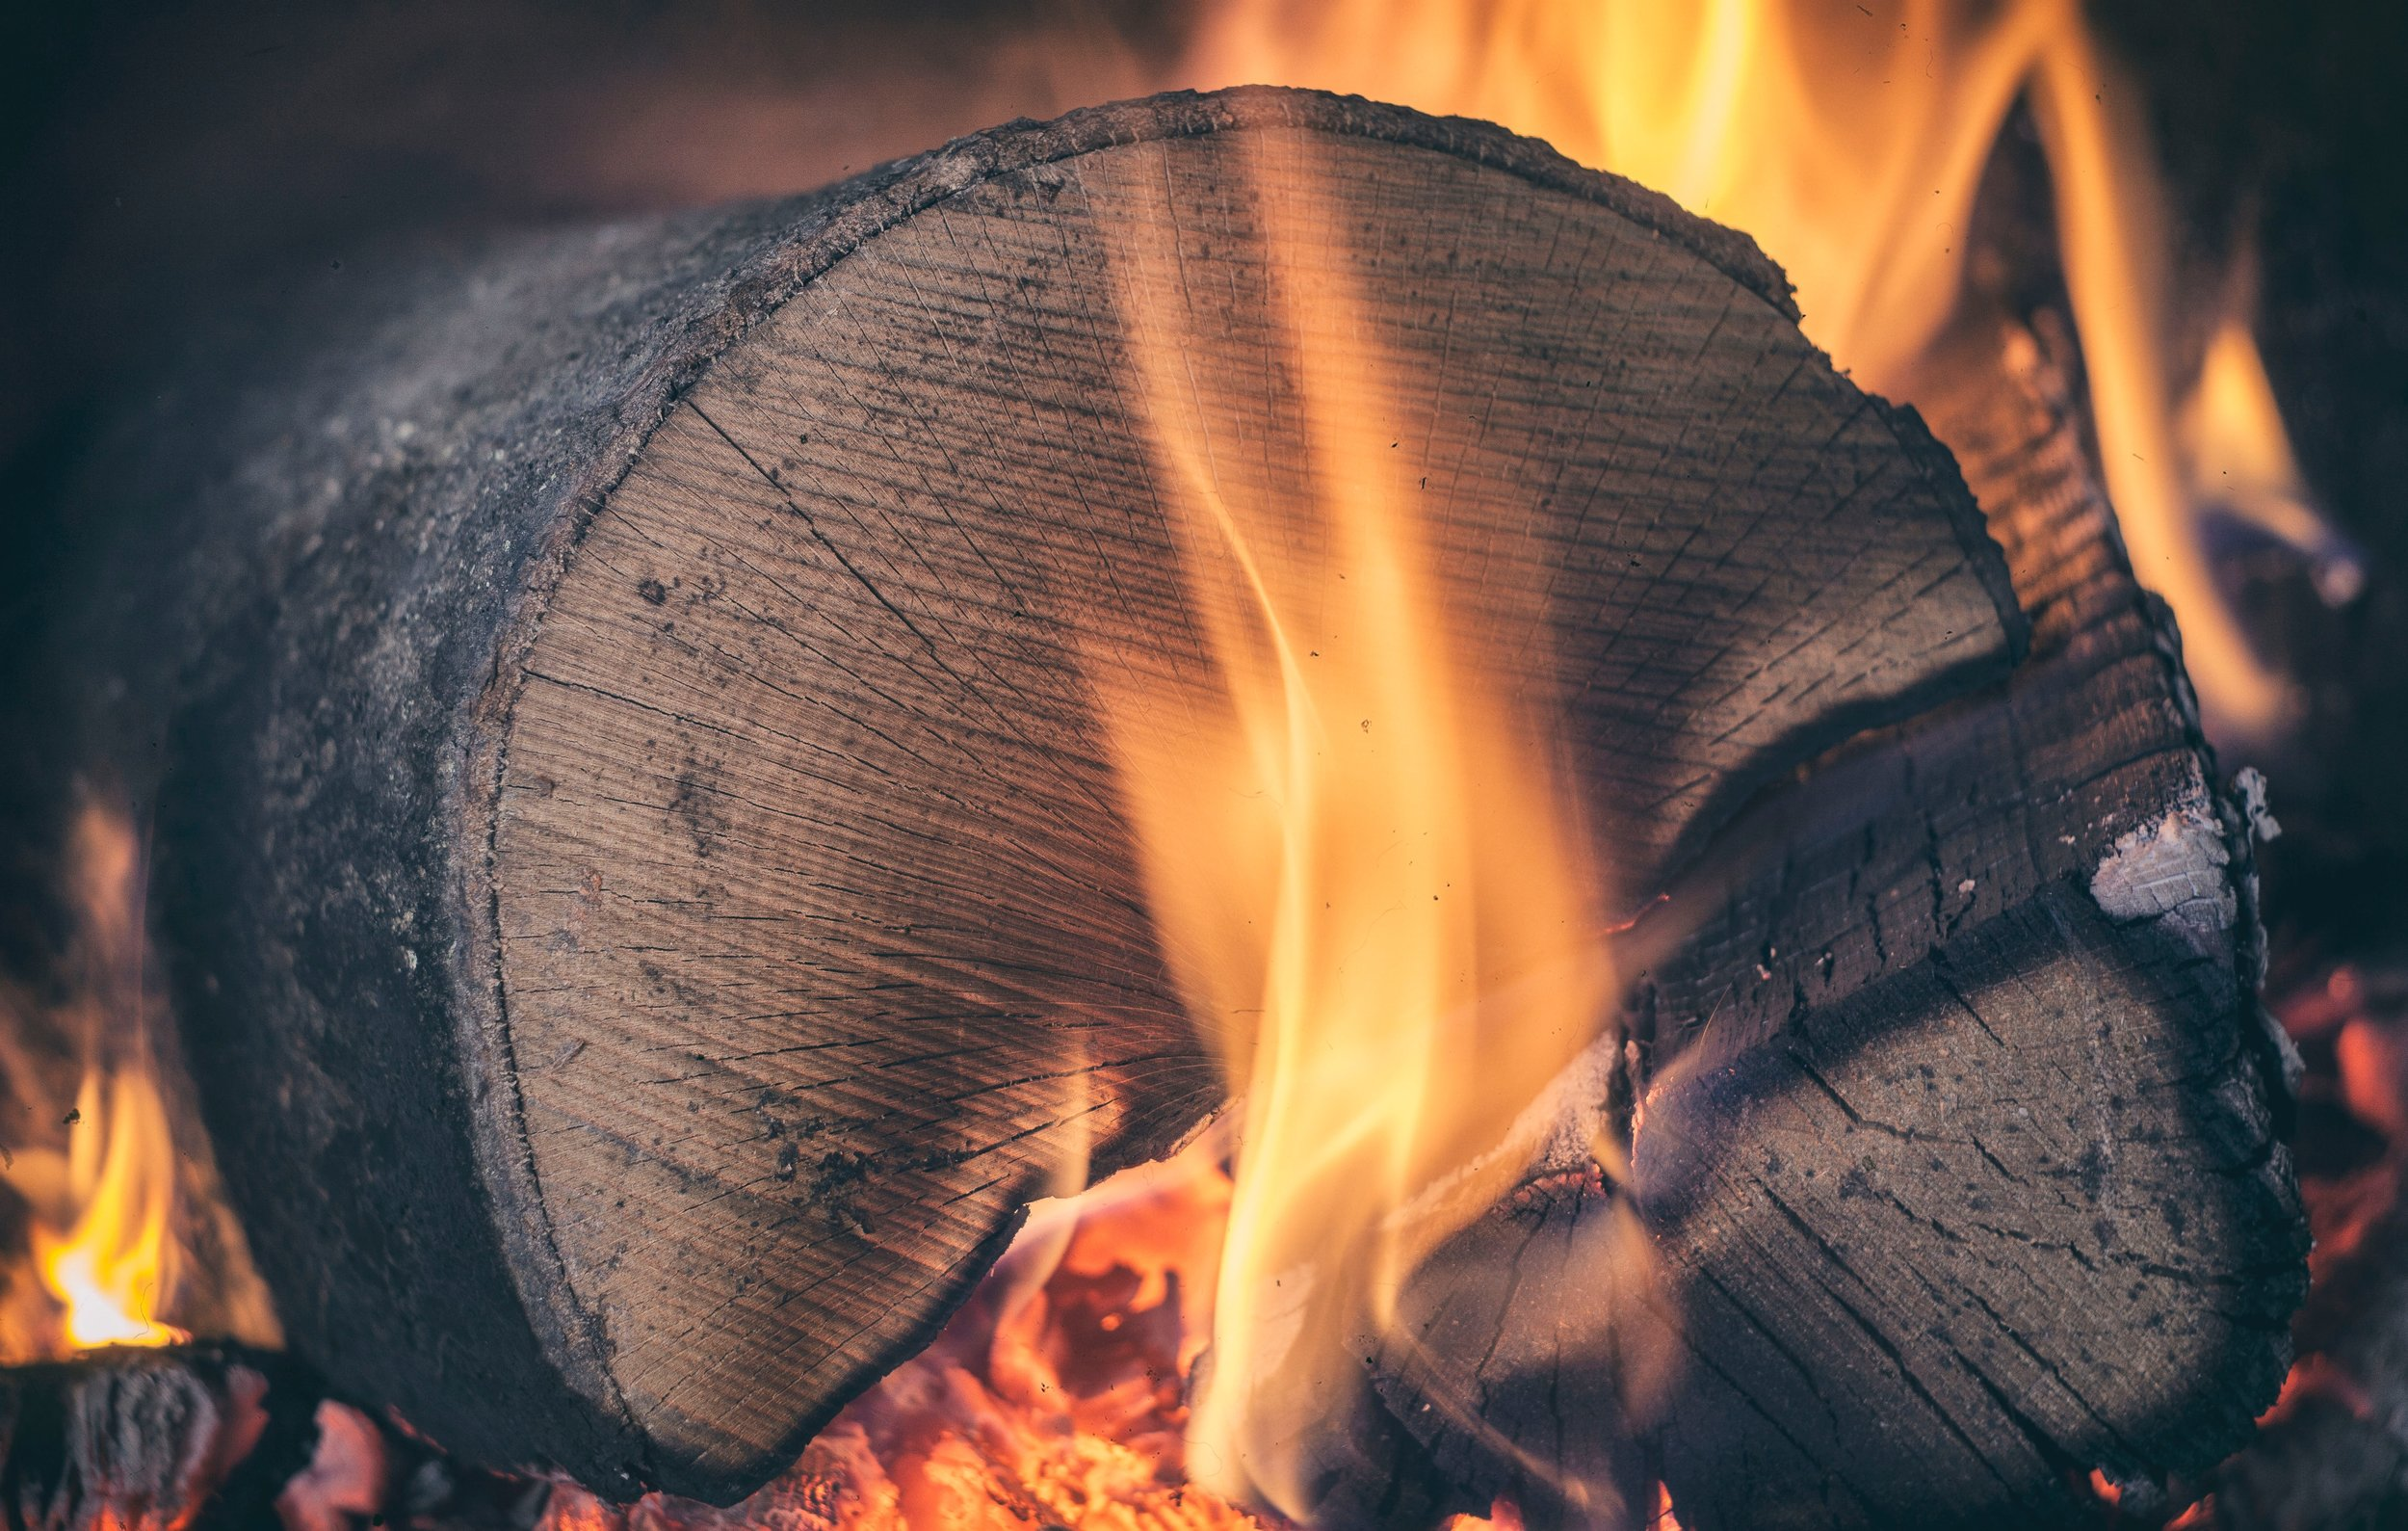 amber-ash-burn-221169.jpg